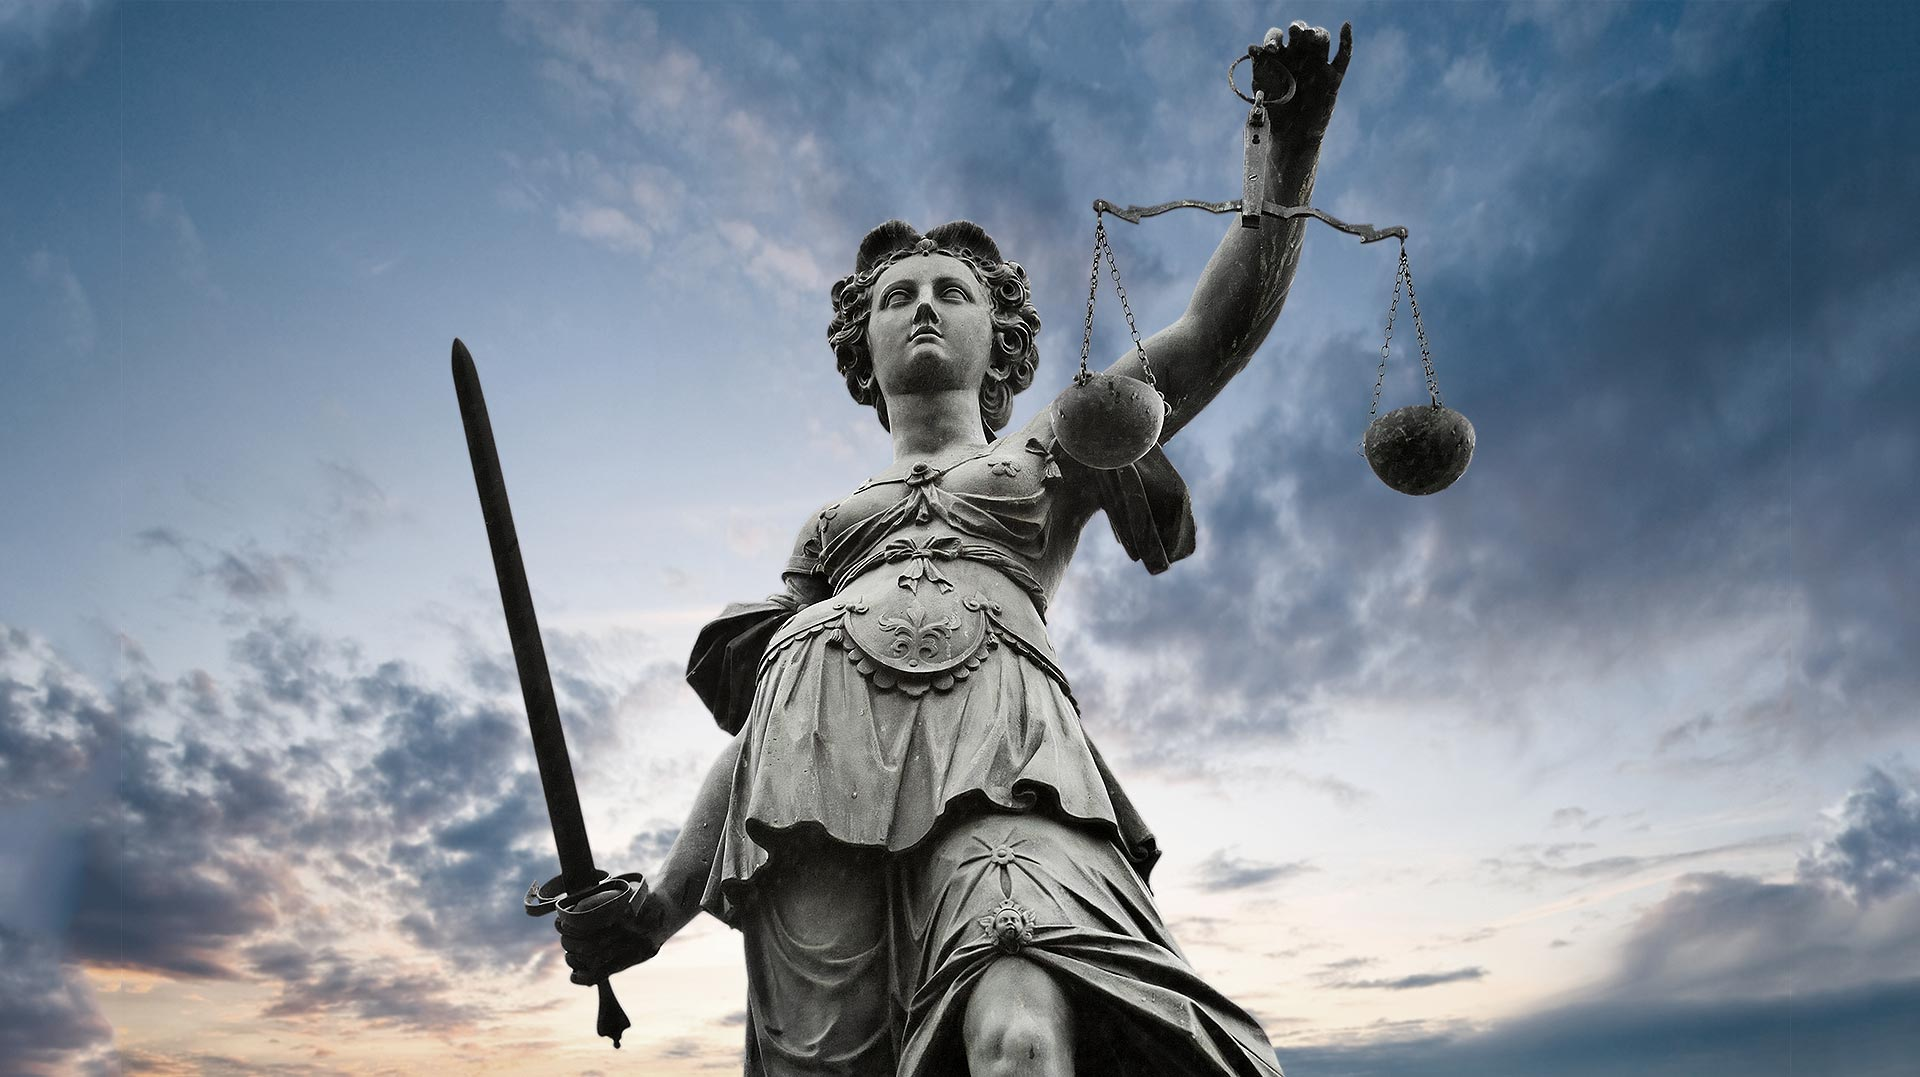 <br>Ihr Erfolg ist unser Erfolg<br>اعتماد خوب است ولی با وکیل با تجربه مشورت کردن بهتر است